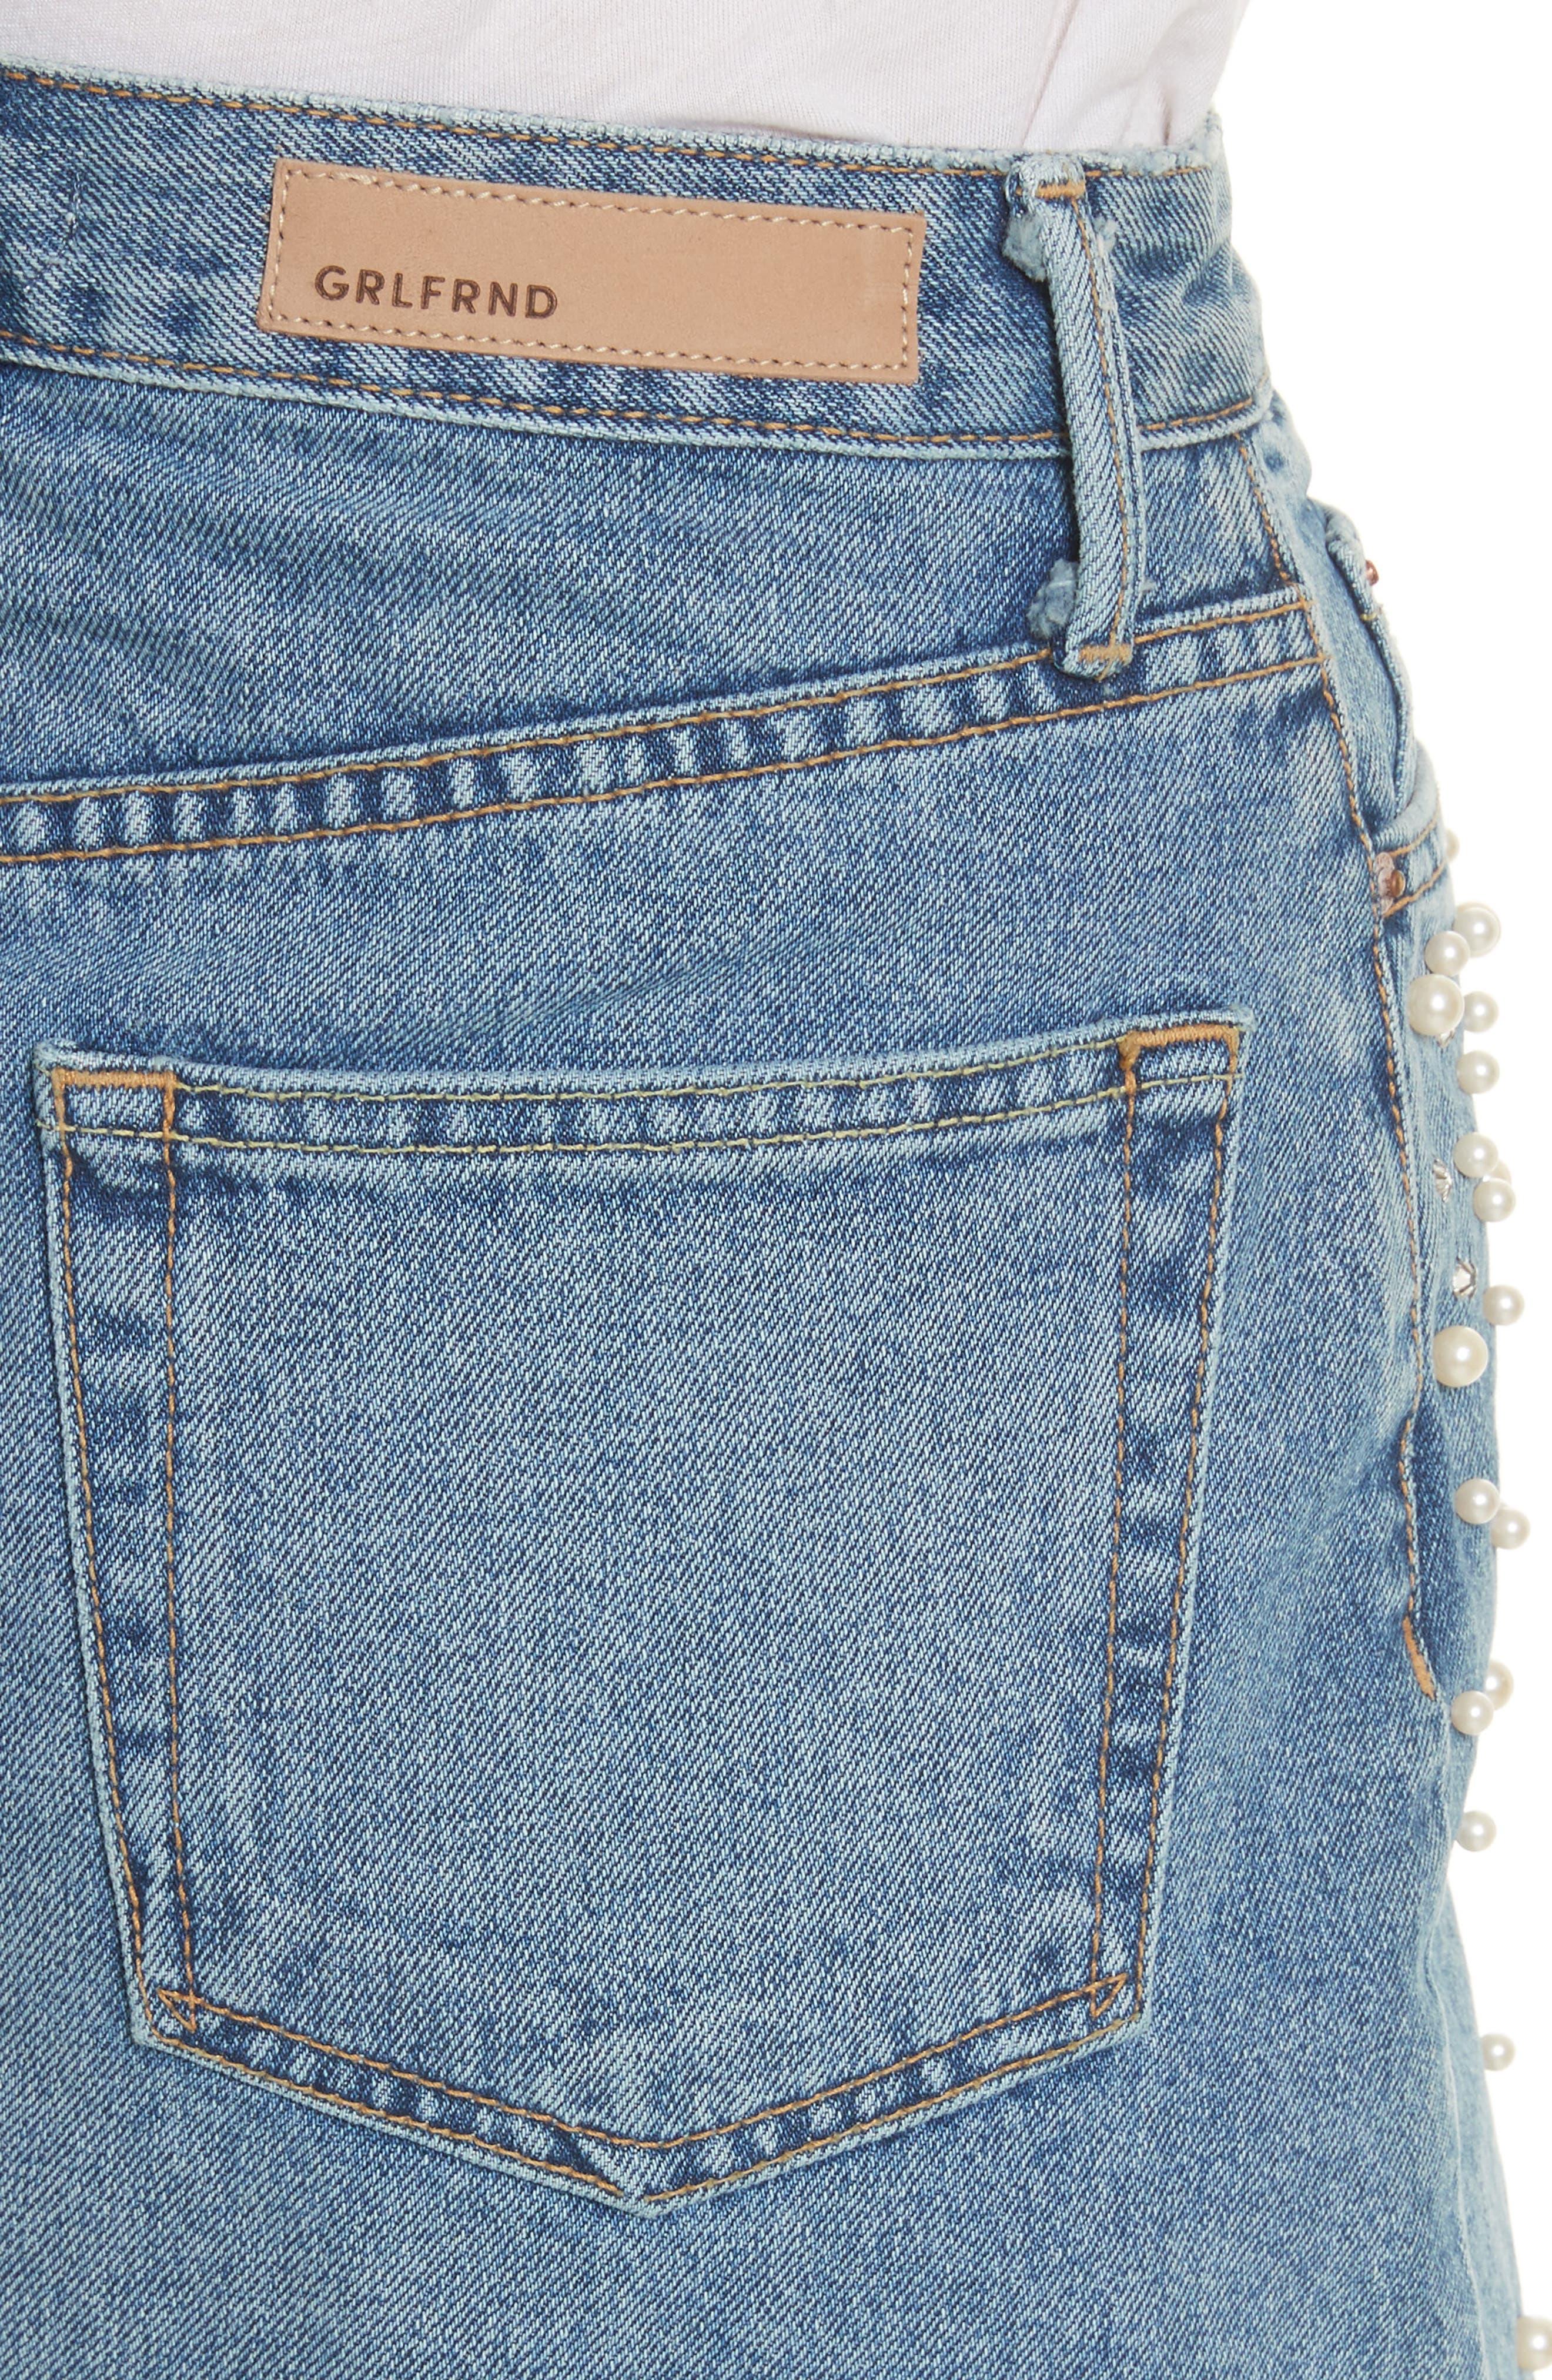 Milla Faux Pearl & Crystal Embellished A-Line Denim Skirt,                             Alternate thumbnail 4, color,                             Solstice